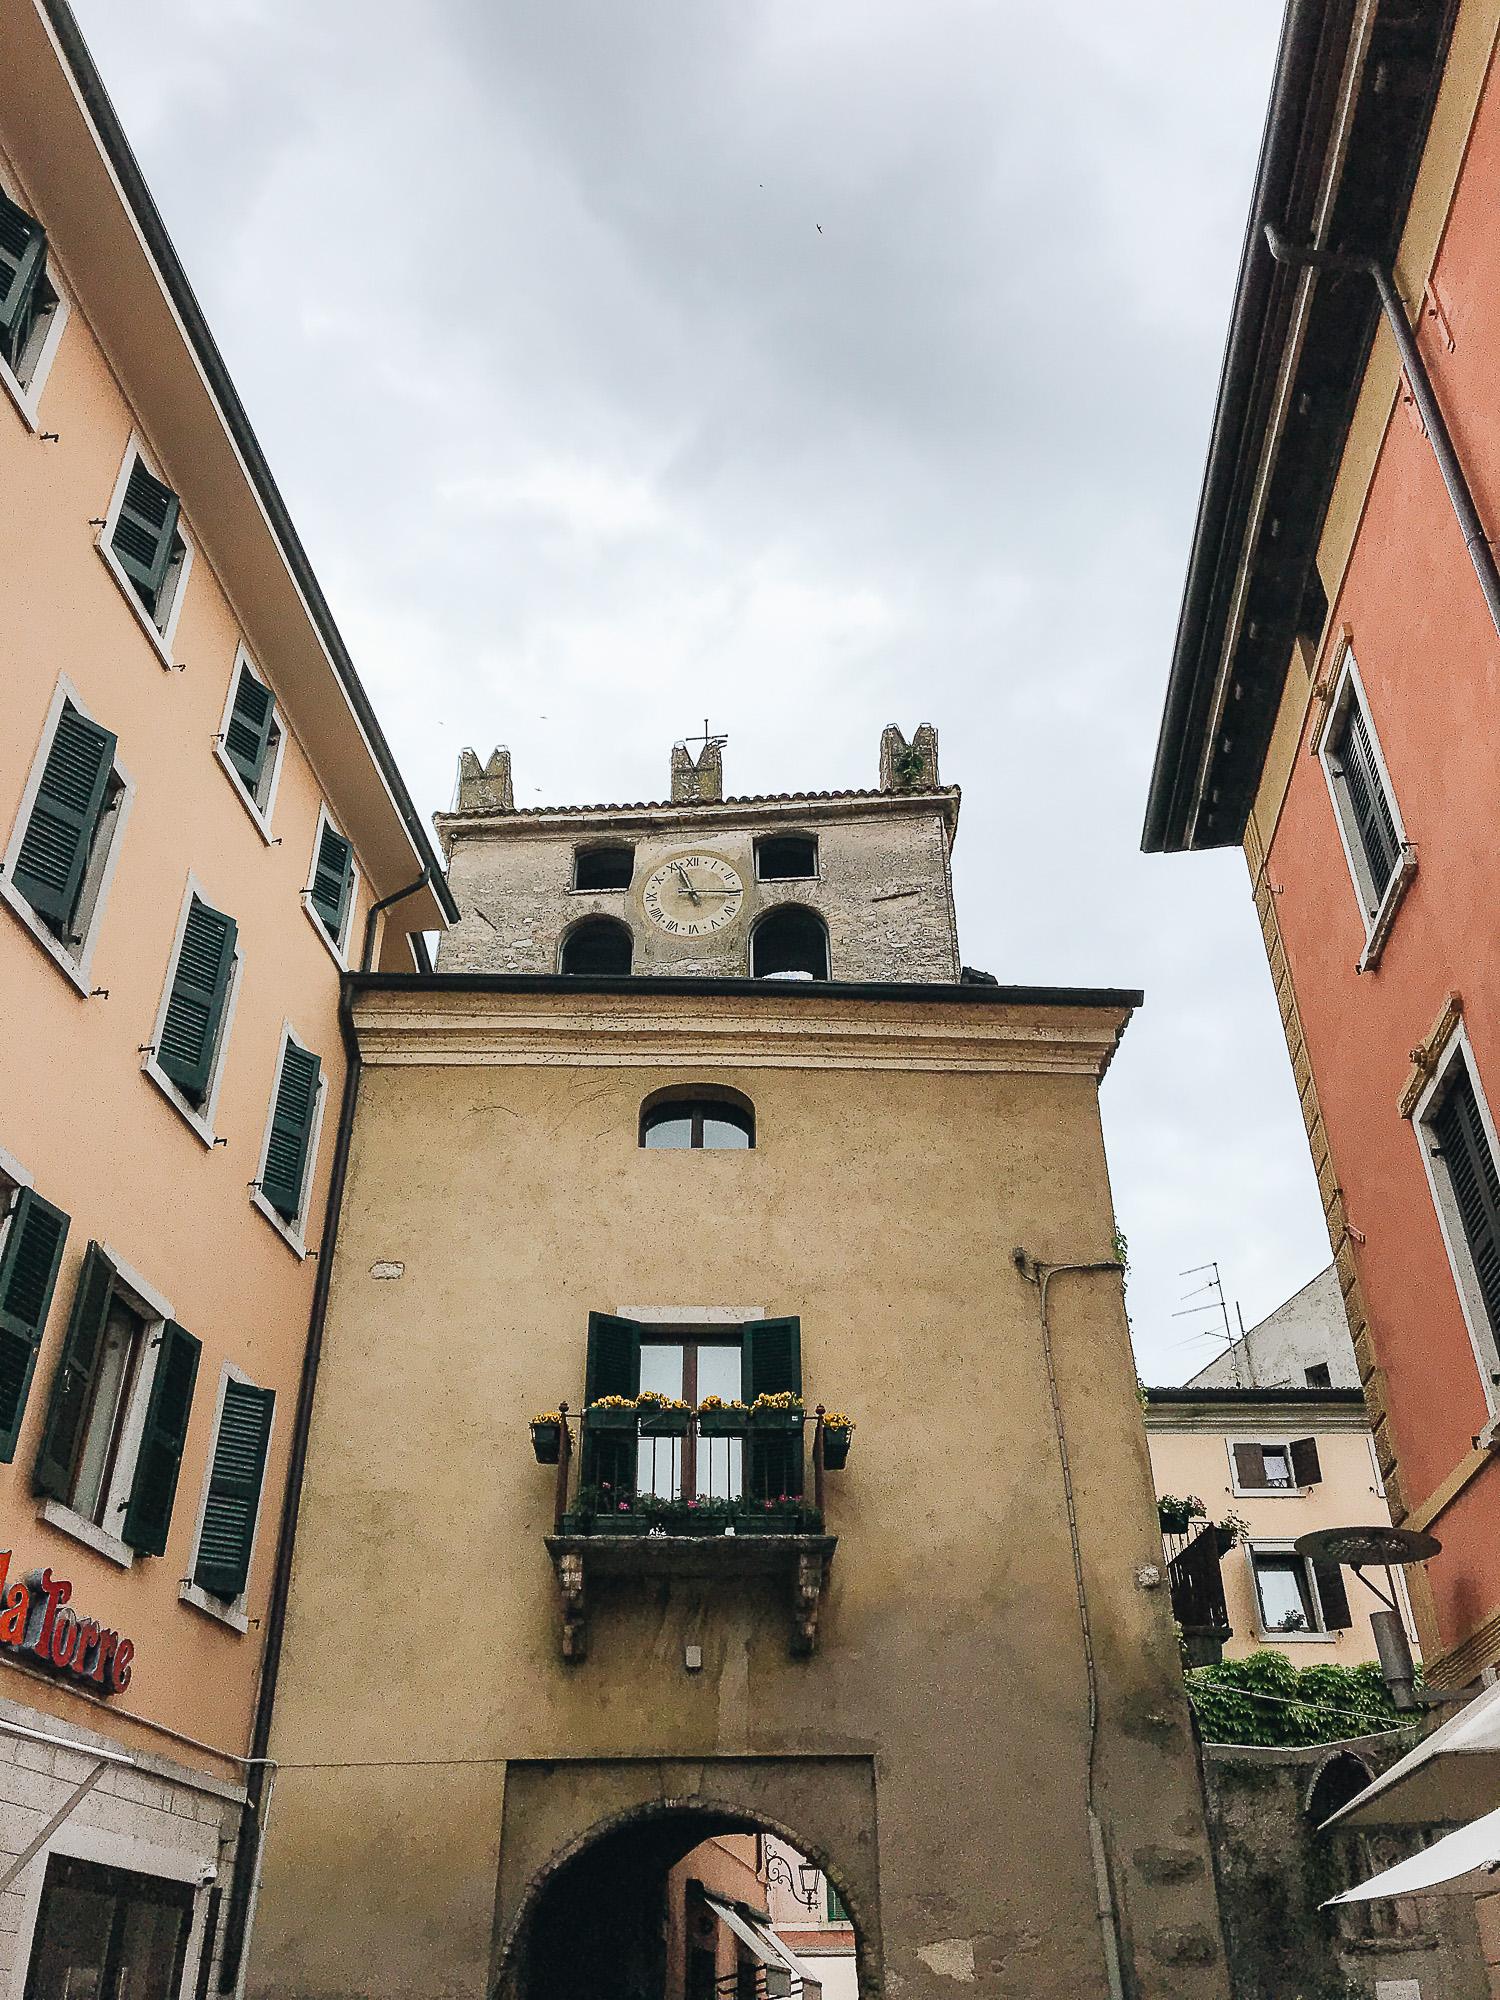 OurBeautifulAdventure-LakeGarda-Italy-Blog-6392.jpg